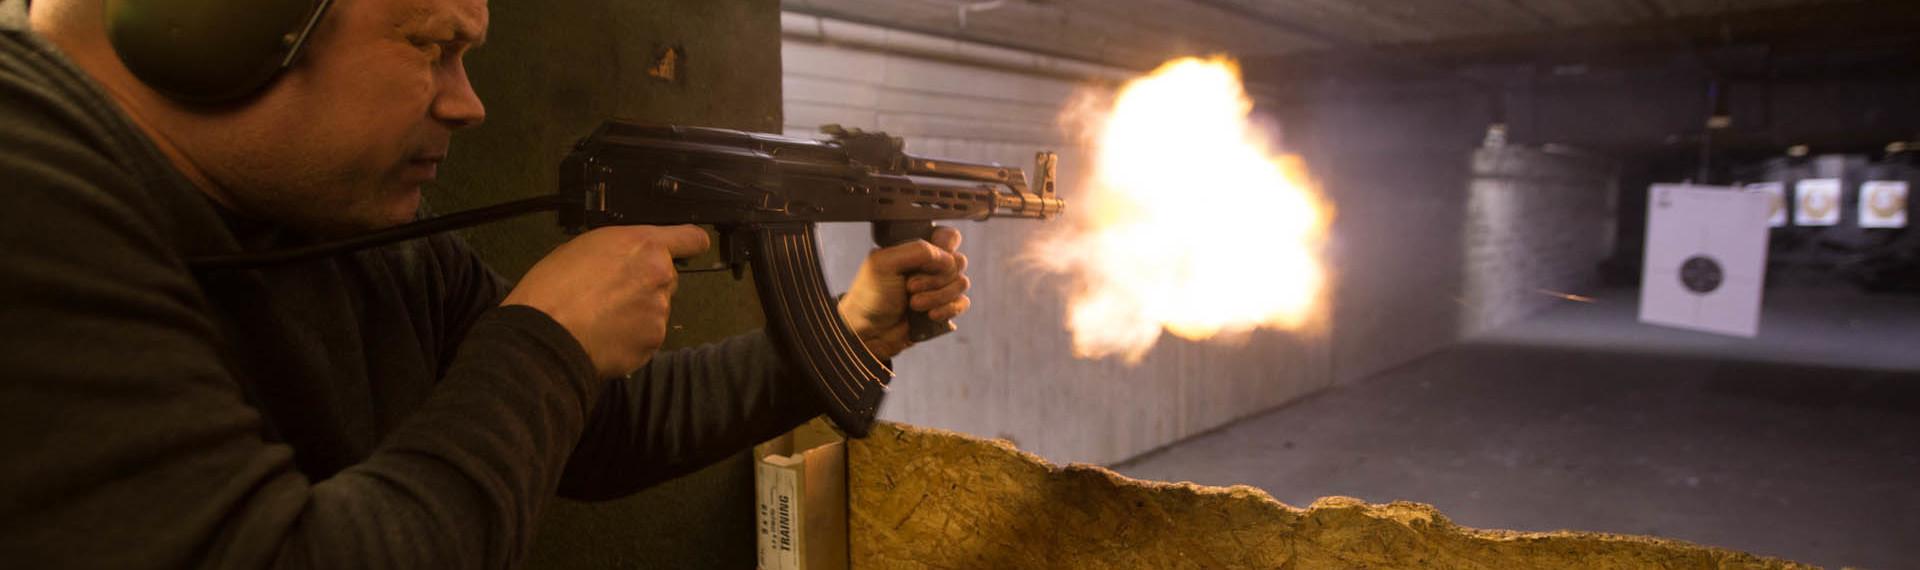 3 Aces - Budget Shooting Budapest